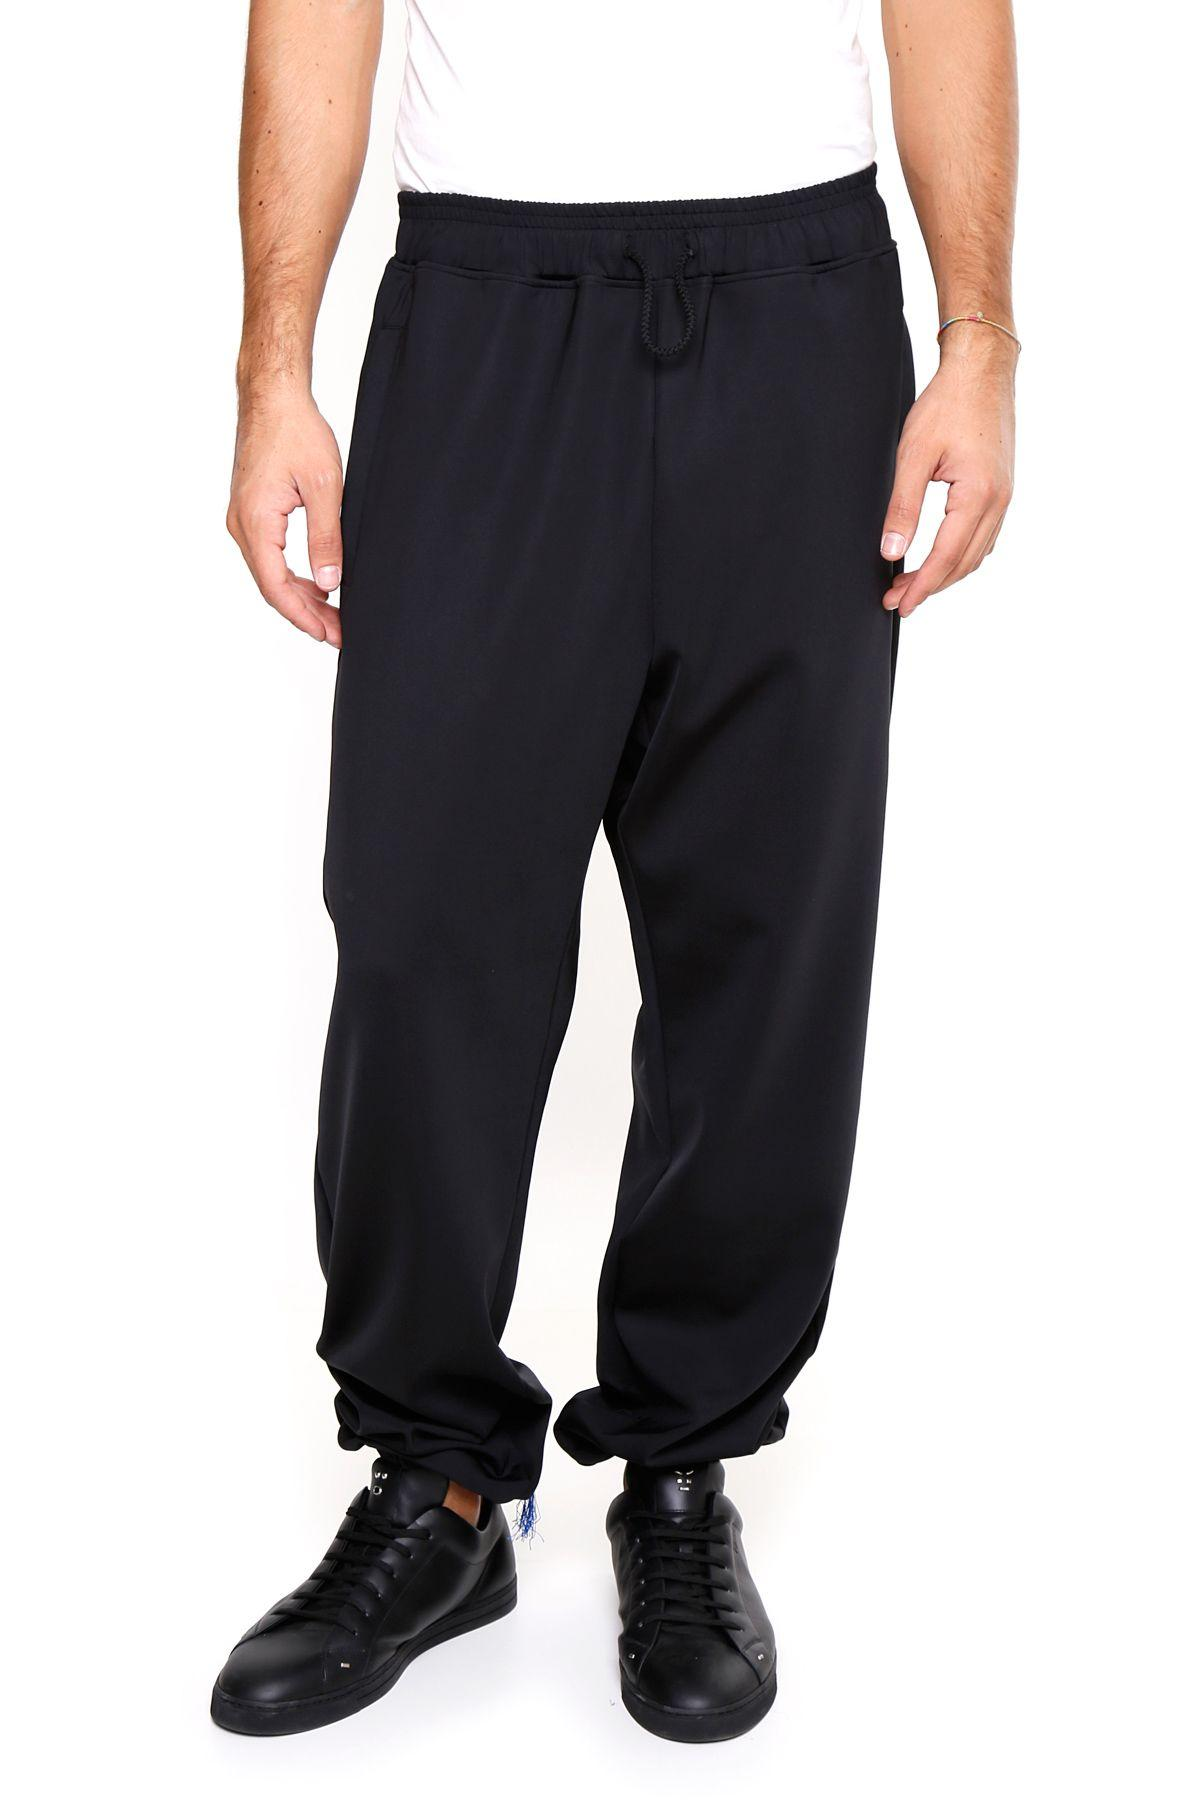 Golden Goose Sam Sweatpants In Black|nero